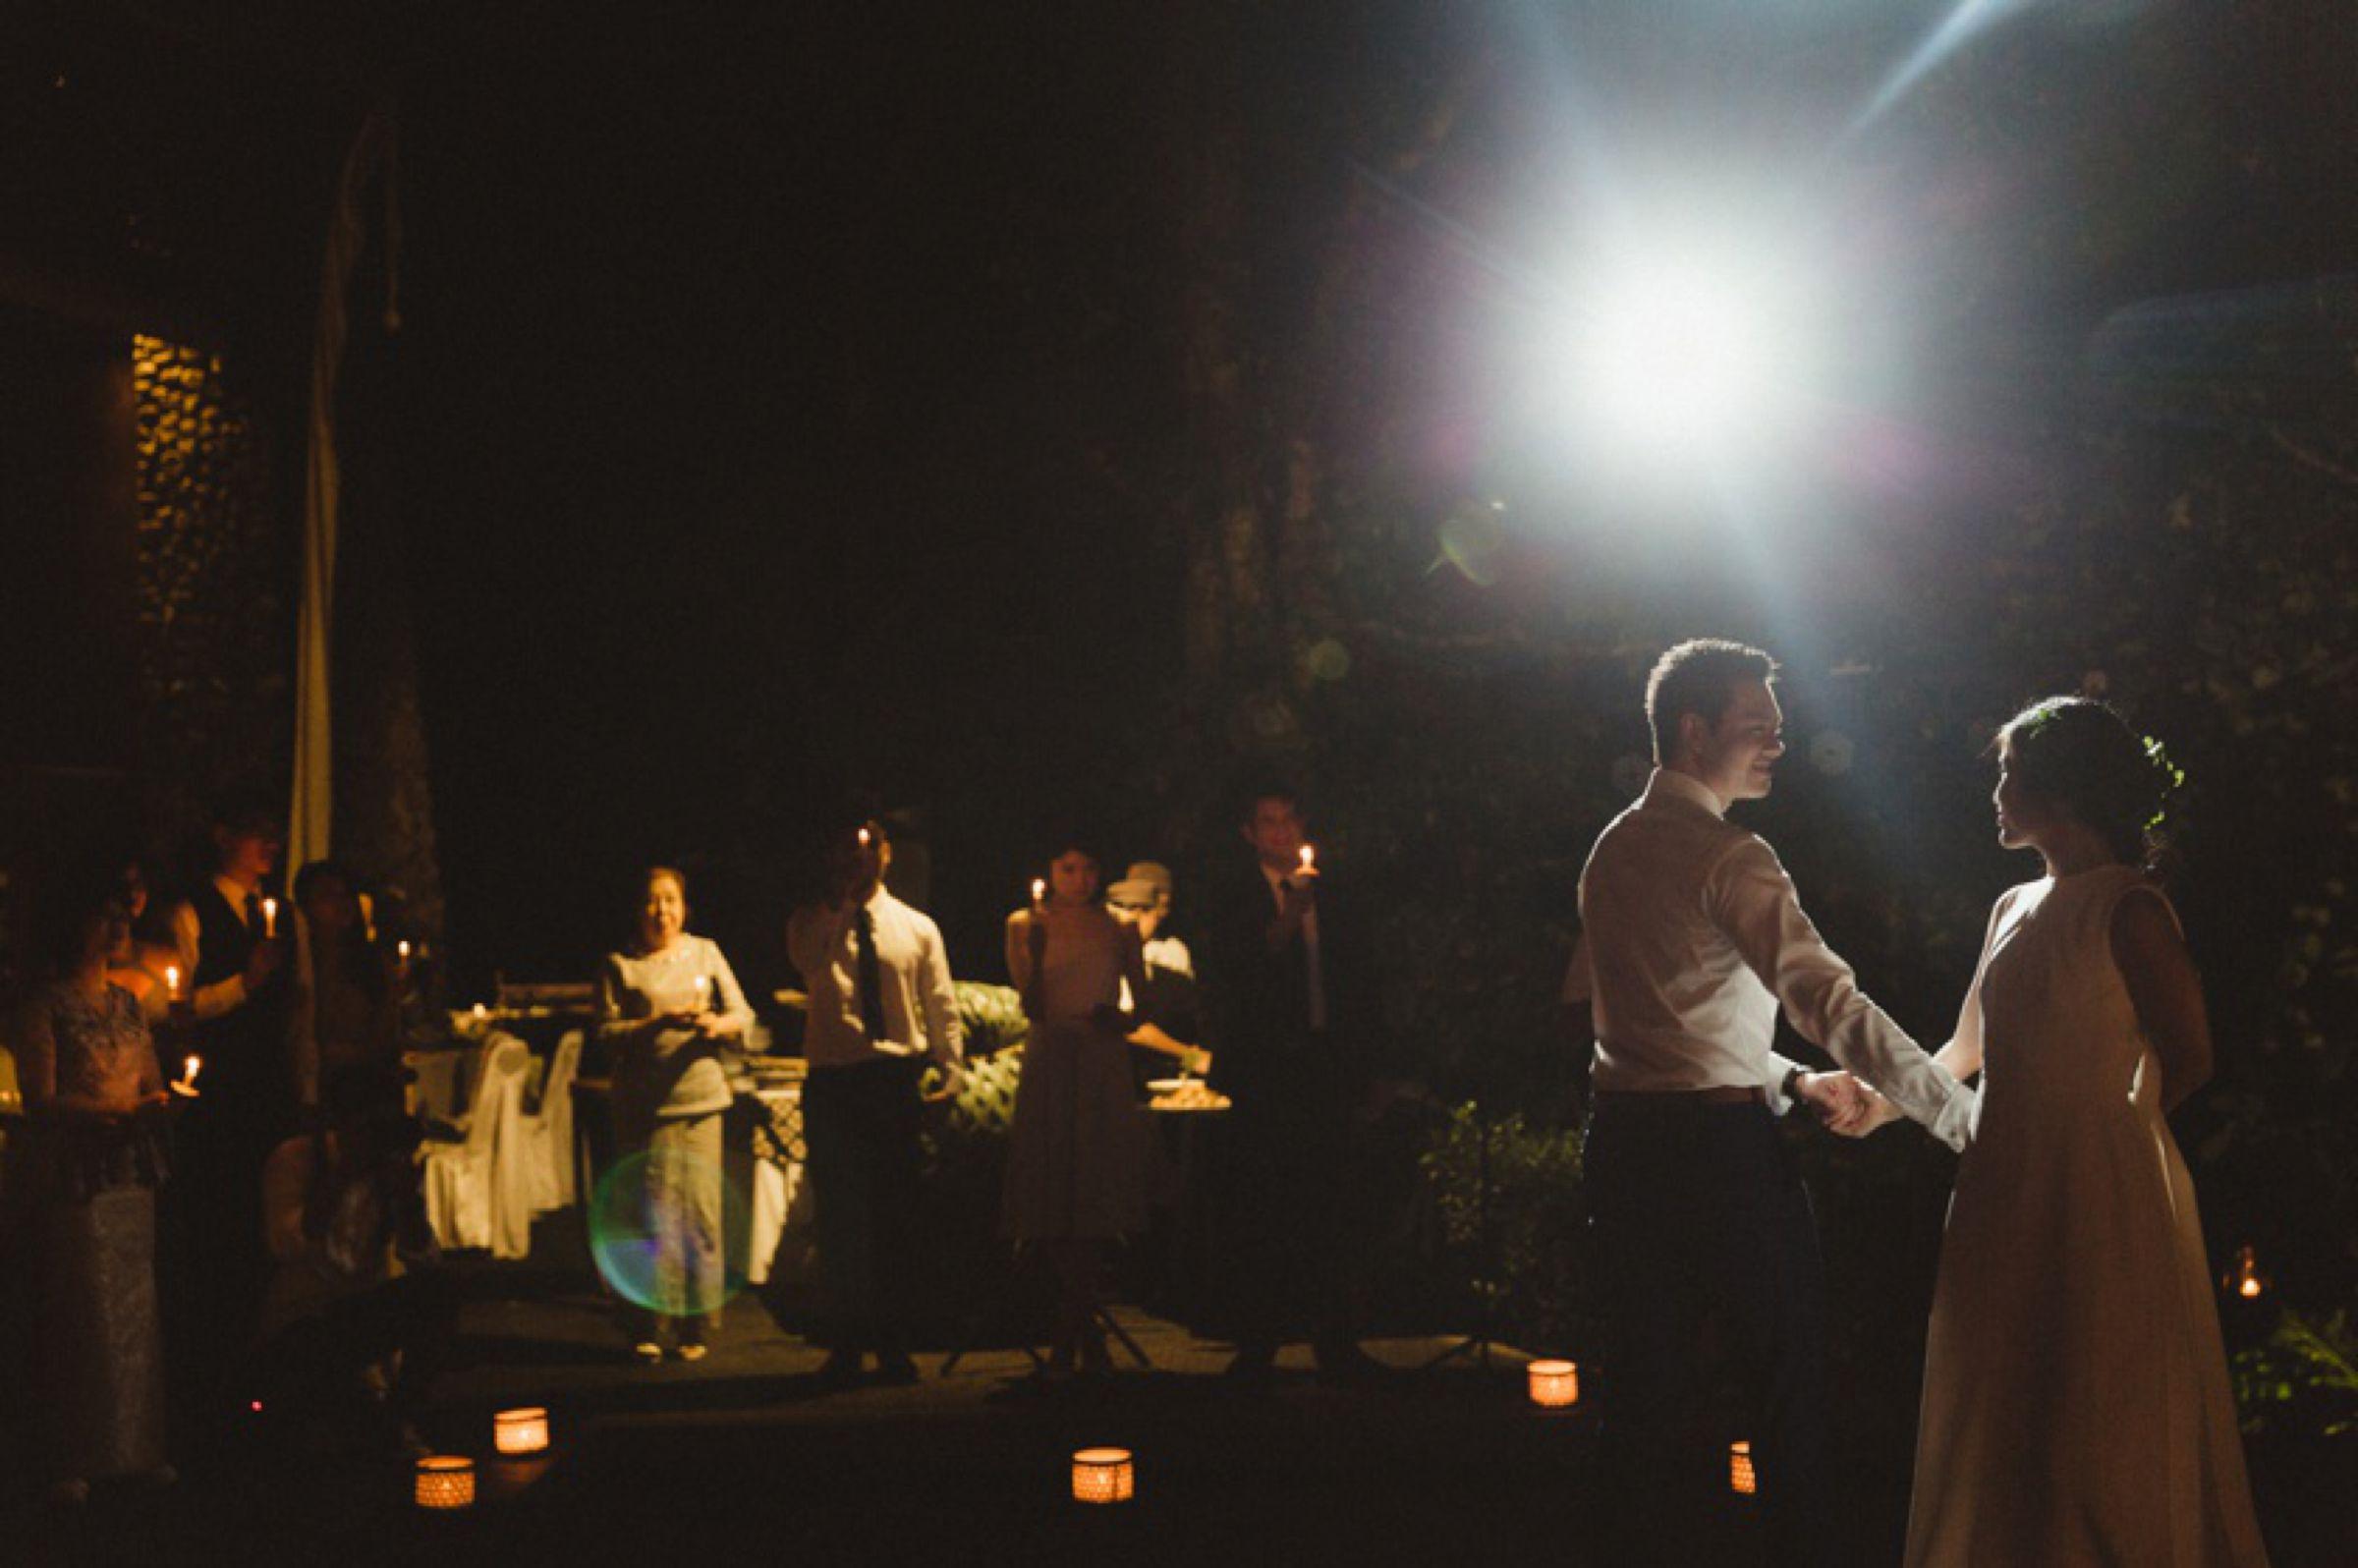 Tim-Danika-Bali-Wedding-Pyara-Photo-Evans 46.jpg